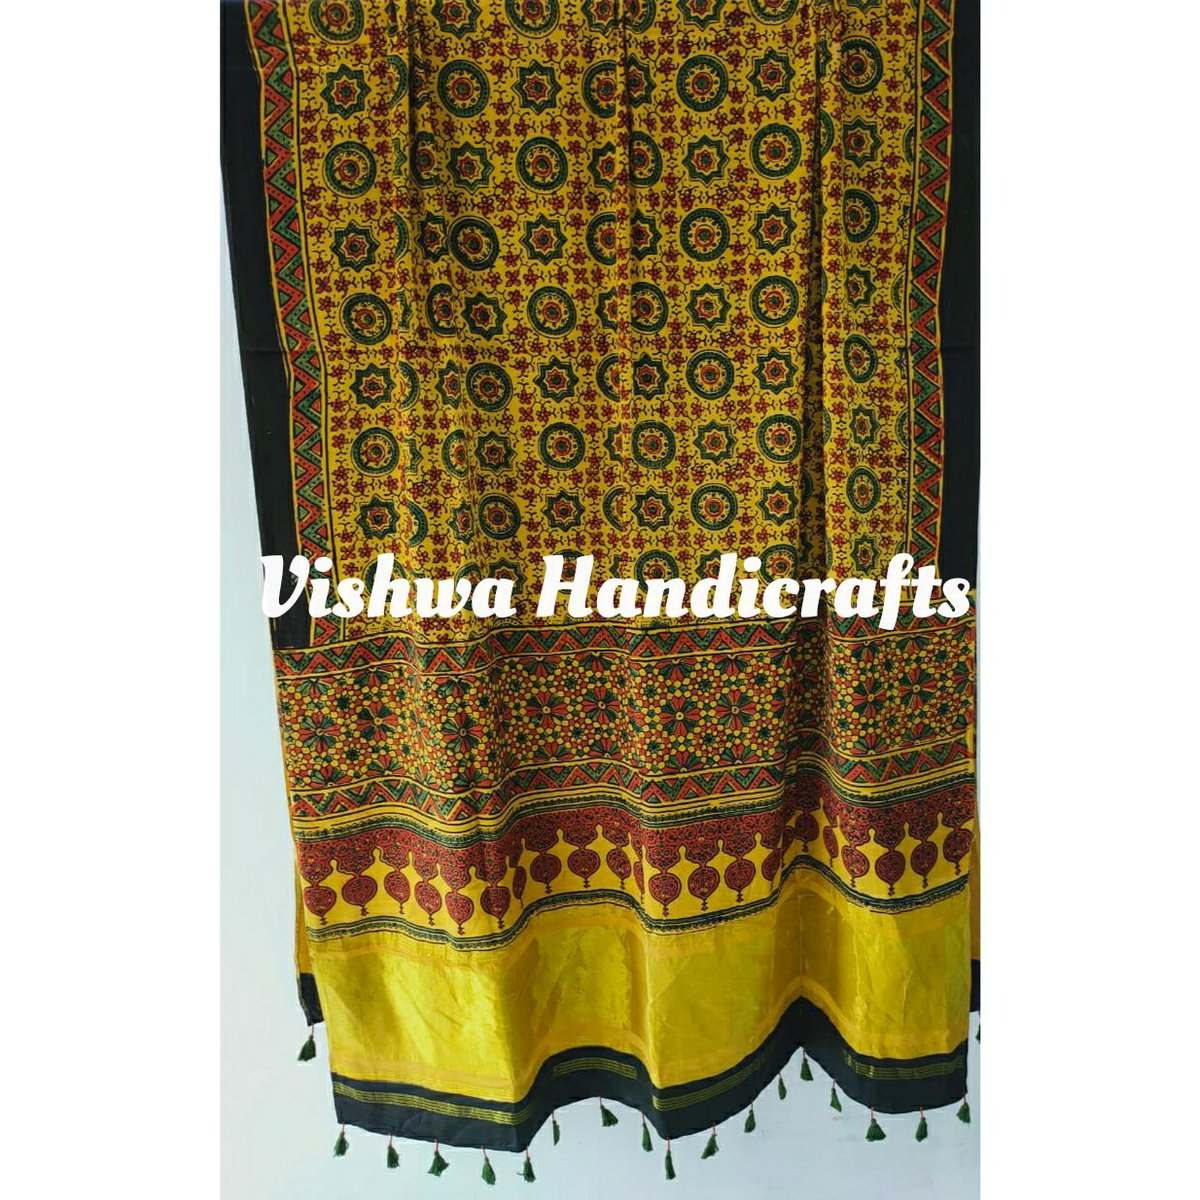 Modal silk ajrakh hand block printed dupatta. #ajrakhdupattas #modalsilk #handblockprint #handmade #handcrafted #vishwahandicrafts #dupattalove #dupattatwitter #designer #fashion #onlineshopping #dupattaonline #indian #traditionallook #followforfollow #uniquewear #naturalcolour https://t.co/am0psxTSkp